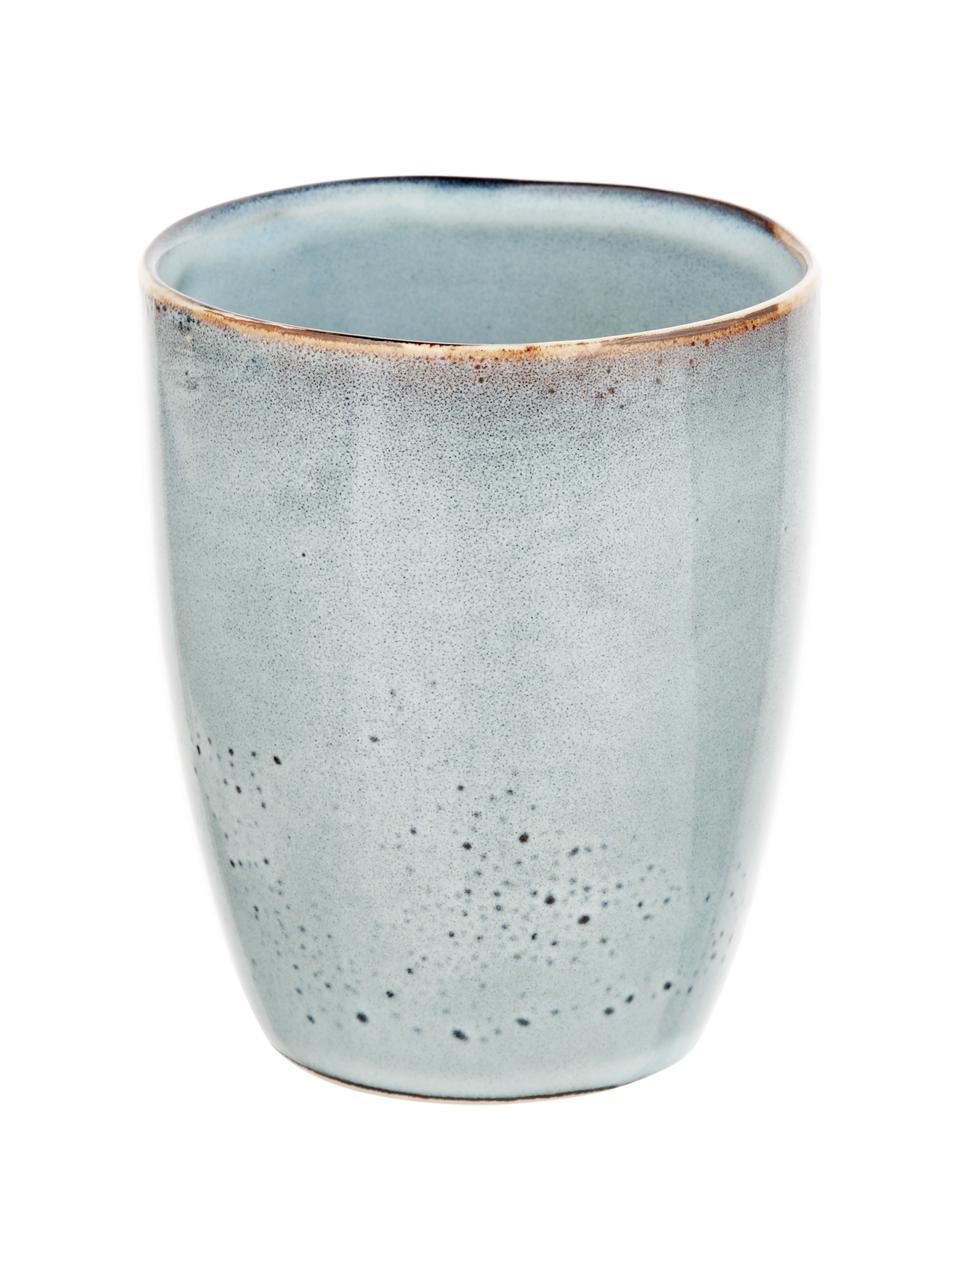 Tazza senza manico in gres blu grigia fatta a mano Thalia 2 pz, Gres, Blu grigio, Ø 9 x Alt. 11 cm